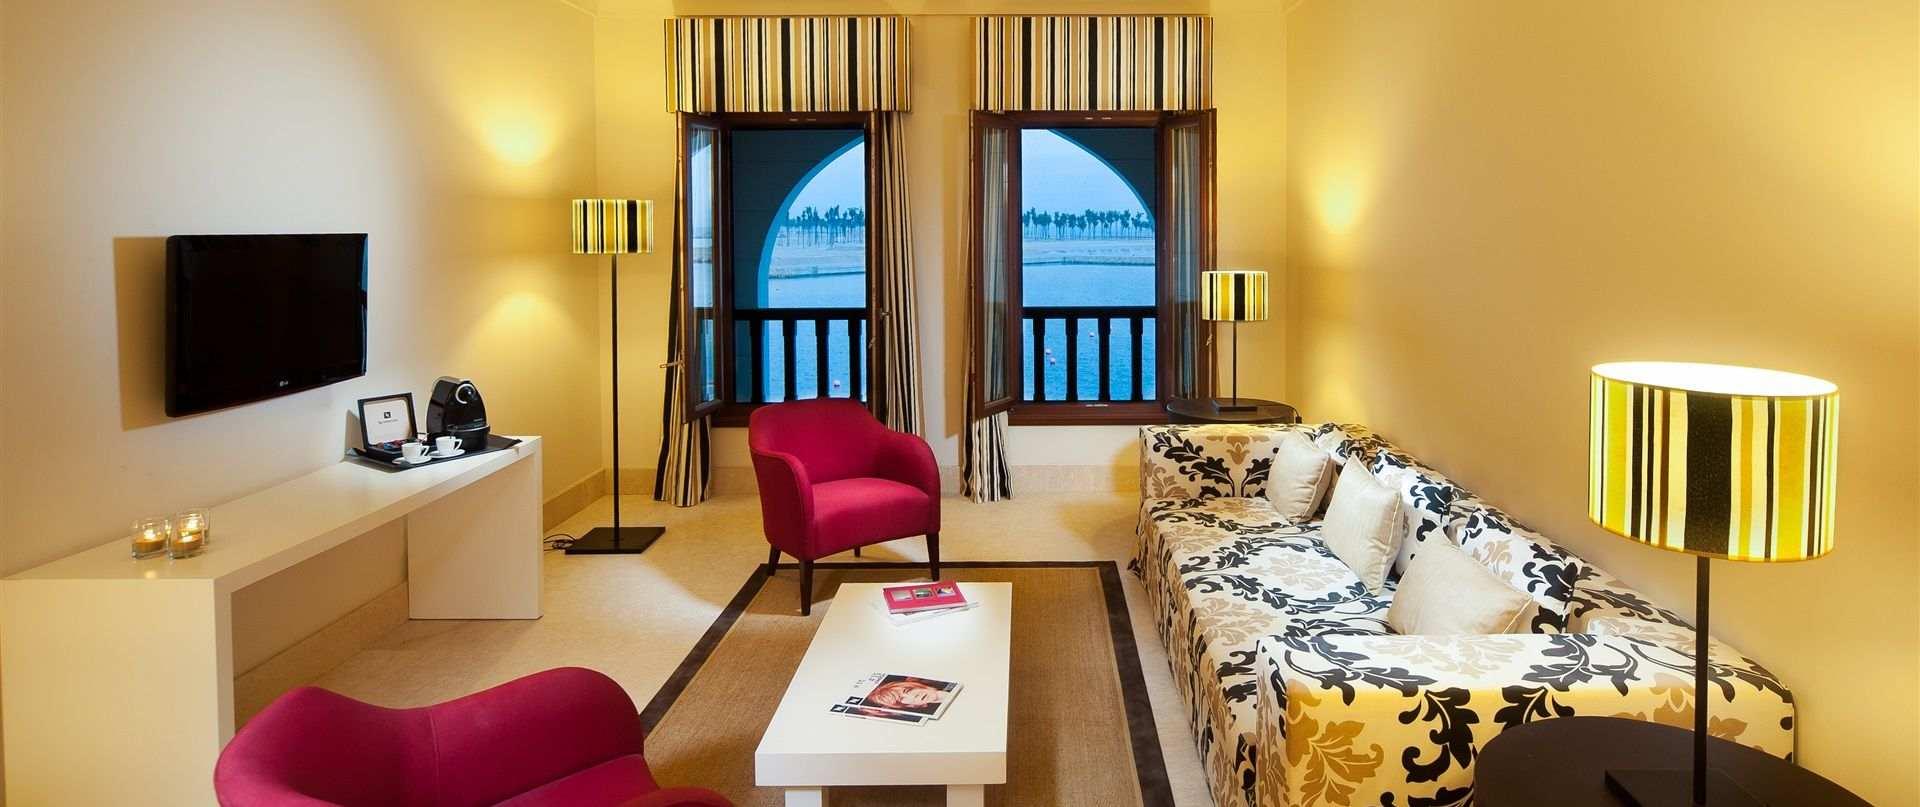 apartment-family-room-juweira-hotel-1.jpg.1920x807_0_144_10000